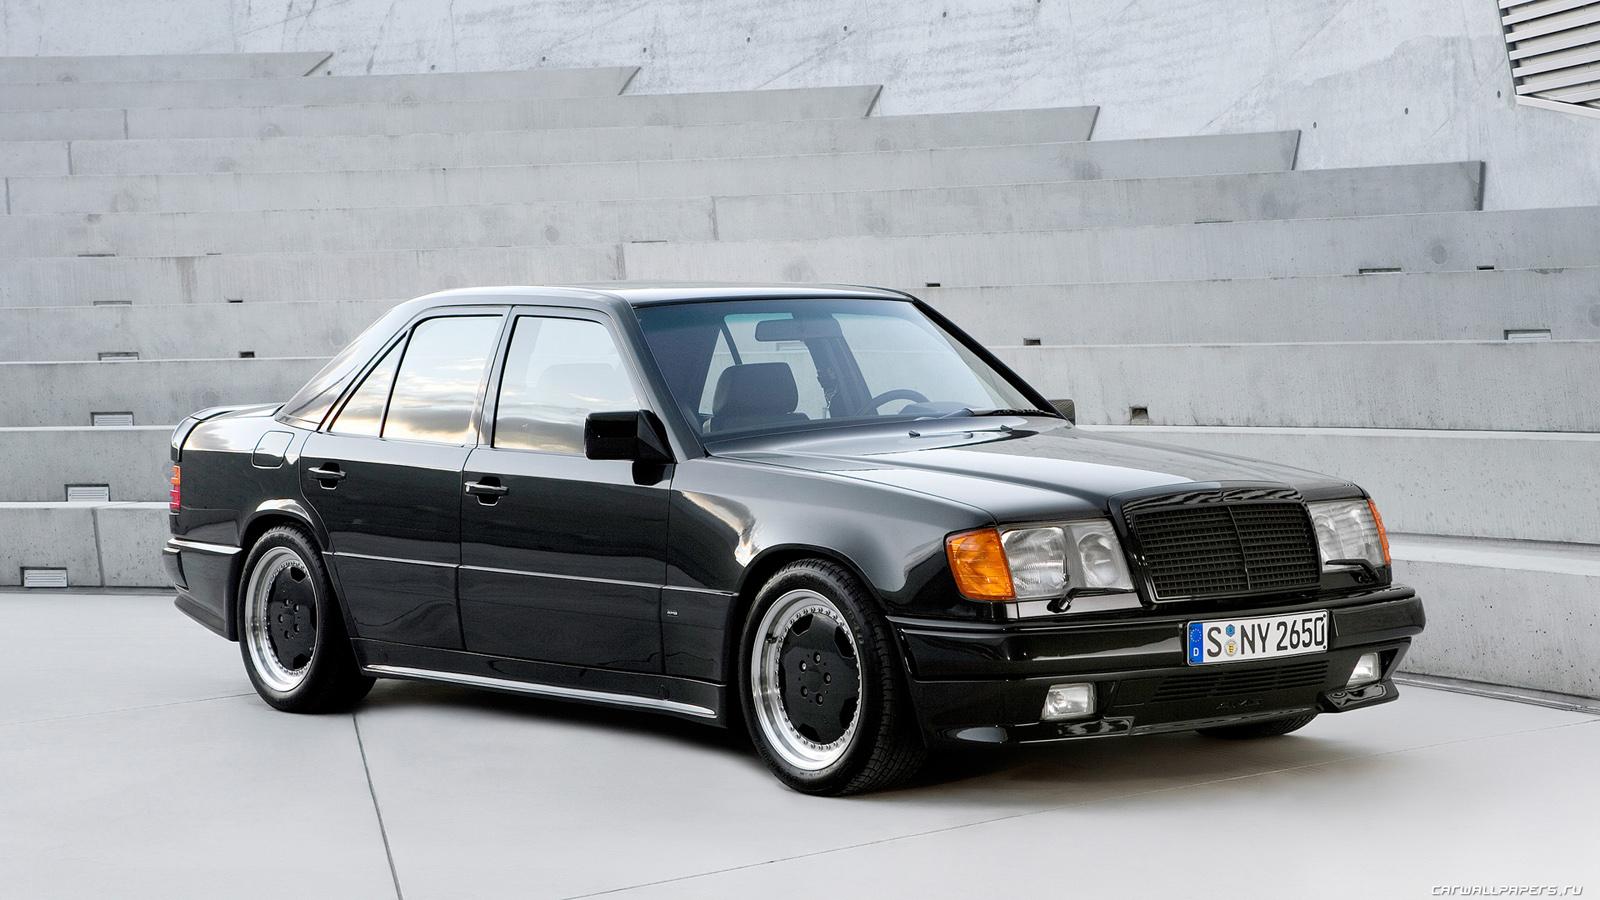 La Velocidad En El Movimiento Junio 2014 Awe Audi Tt Rs Switchpath Exhaust System Diagram Eurocar News Mercedes Benz 300e